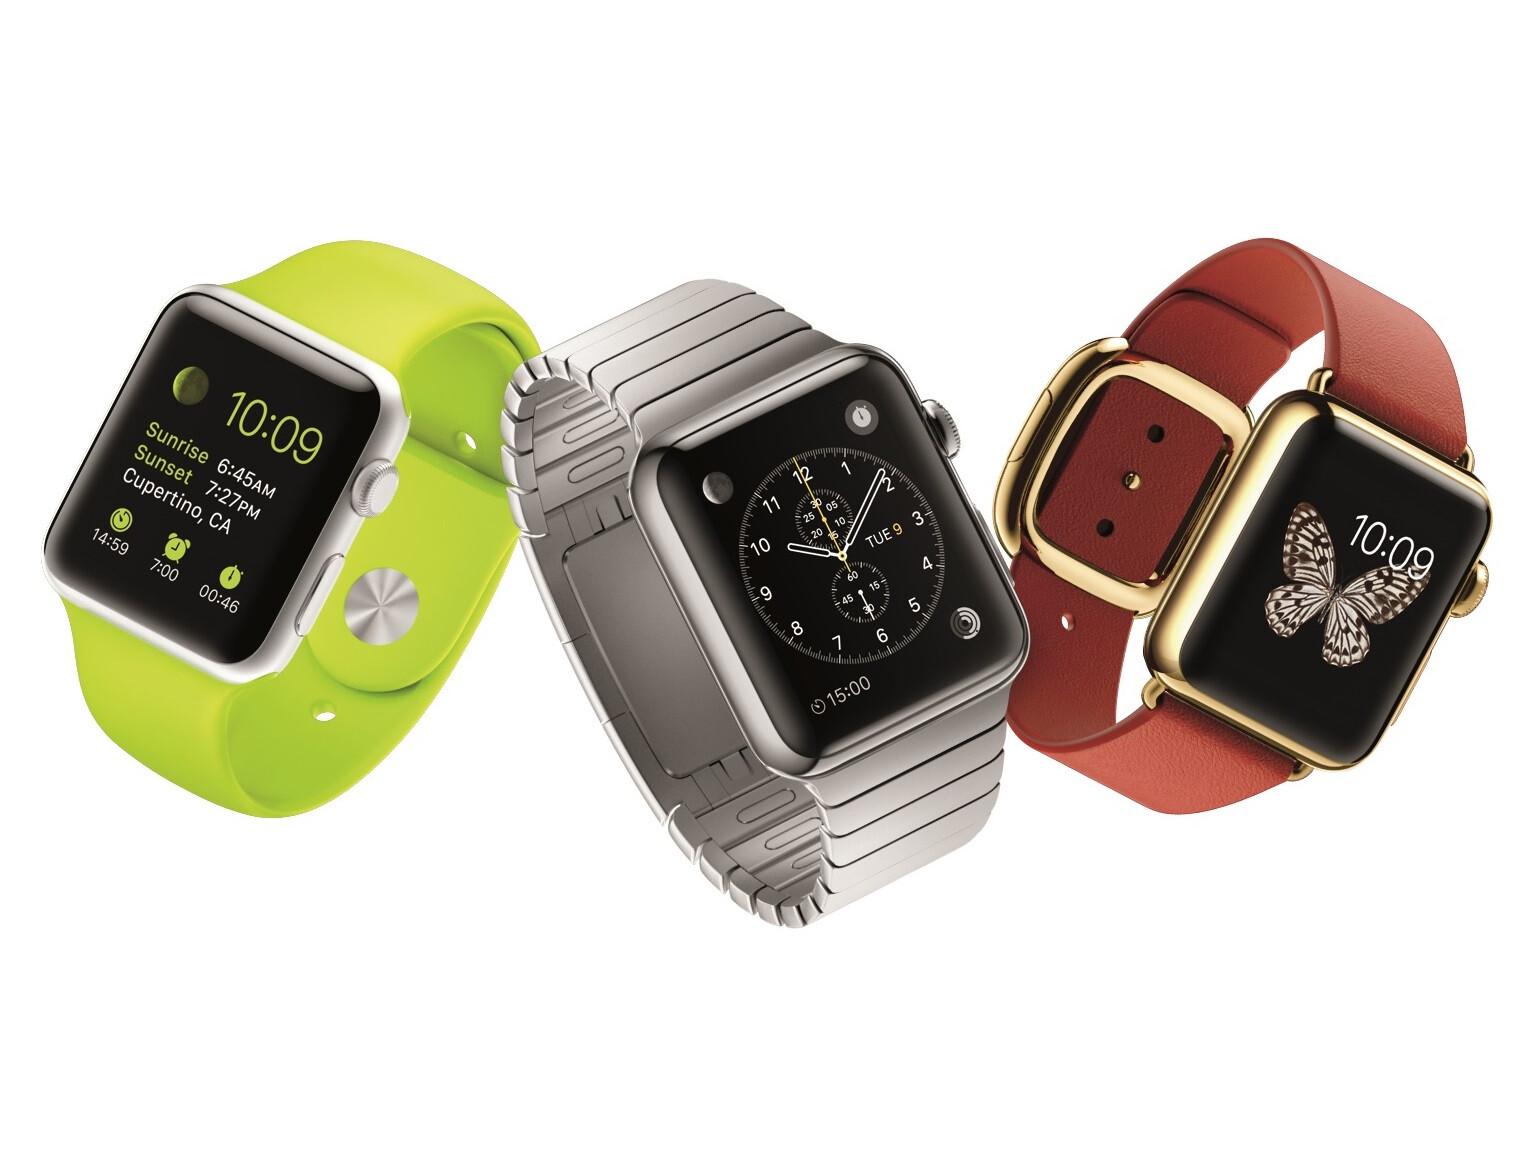 Iphone Watch Bands Best Buy